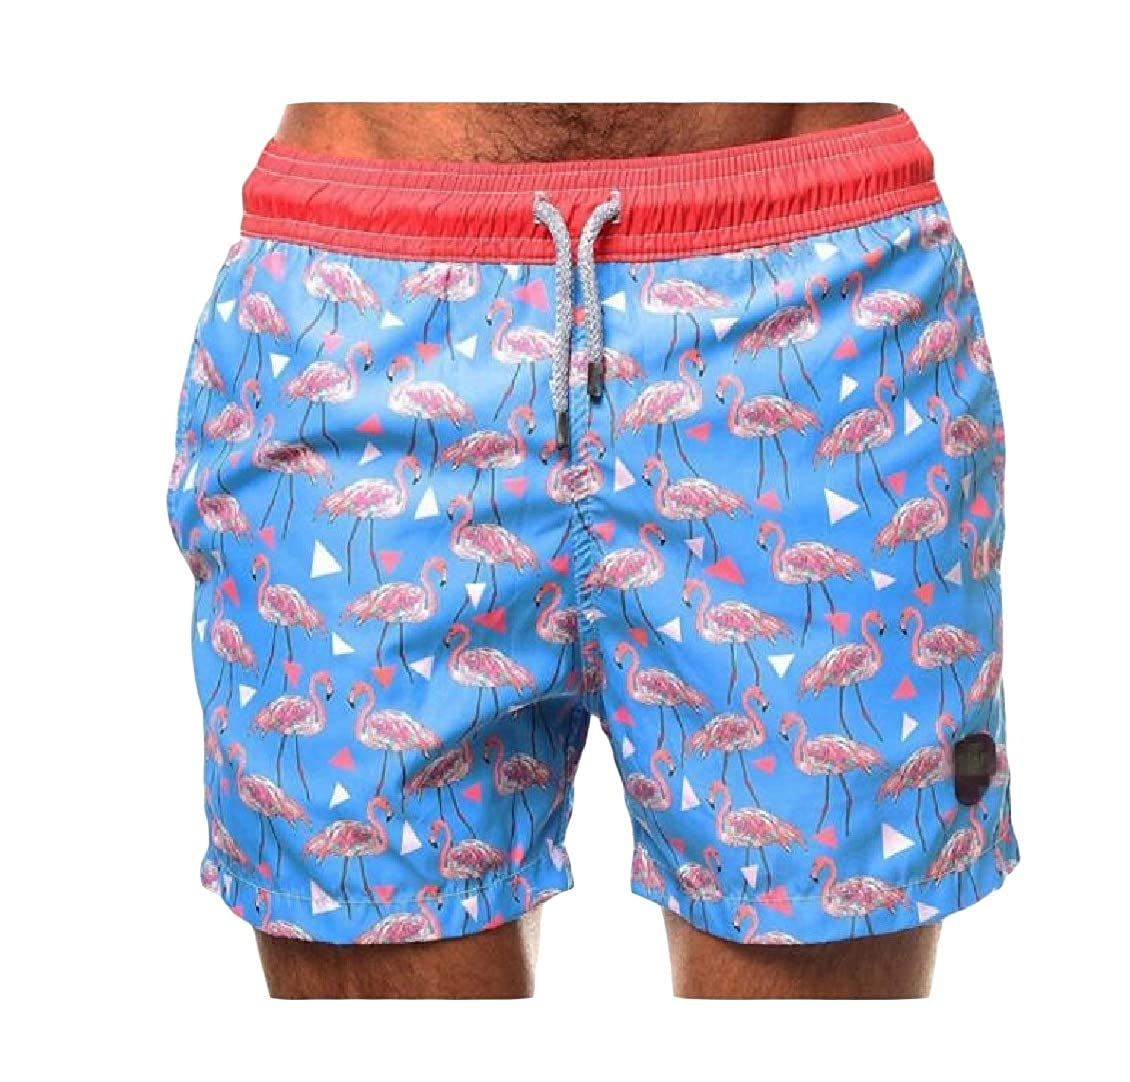 Hajotrawa Mens Sport All-Match Beach Elastic Waist Slim Fit Printed Short